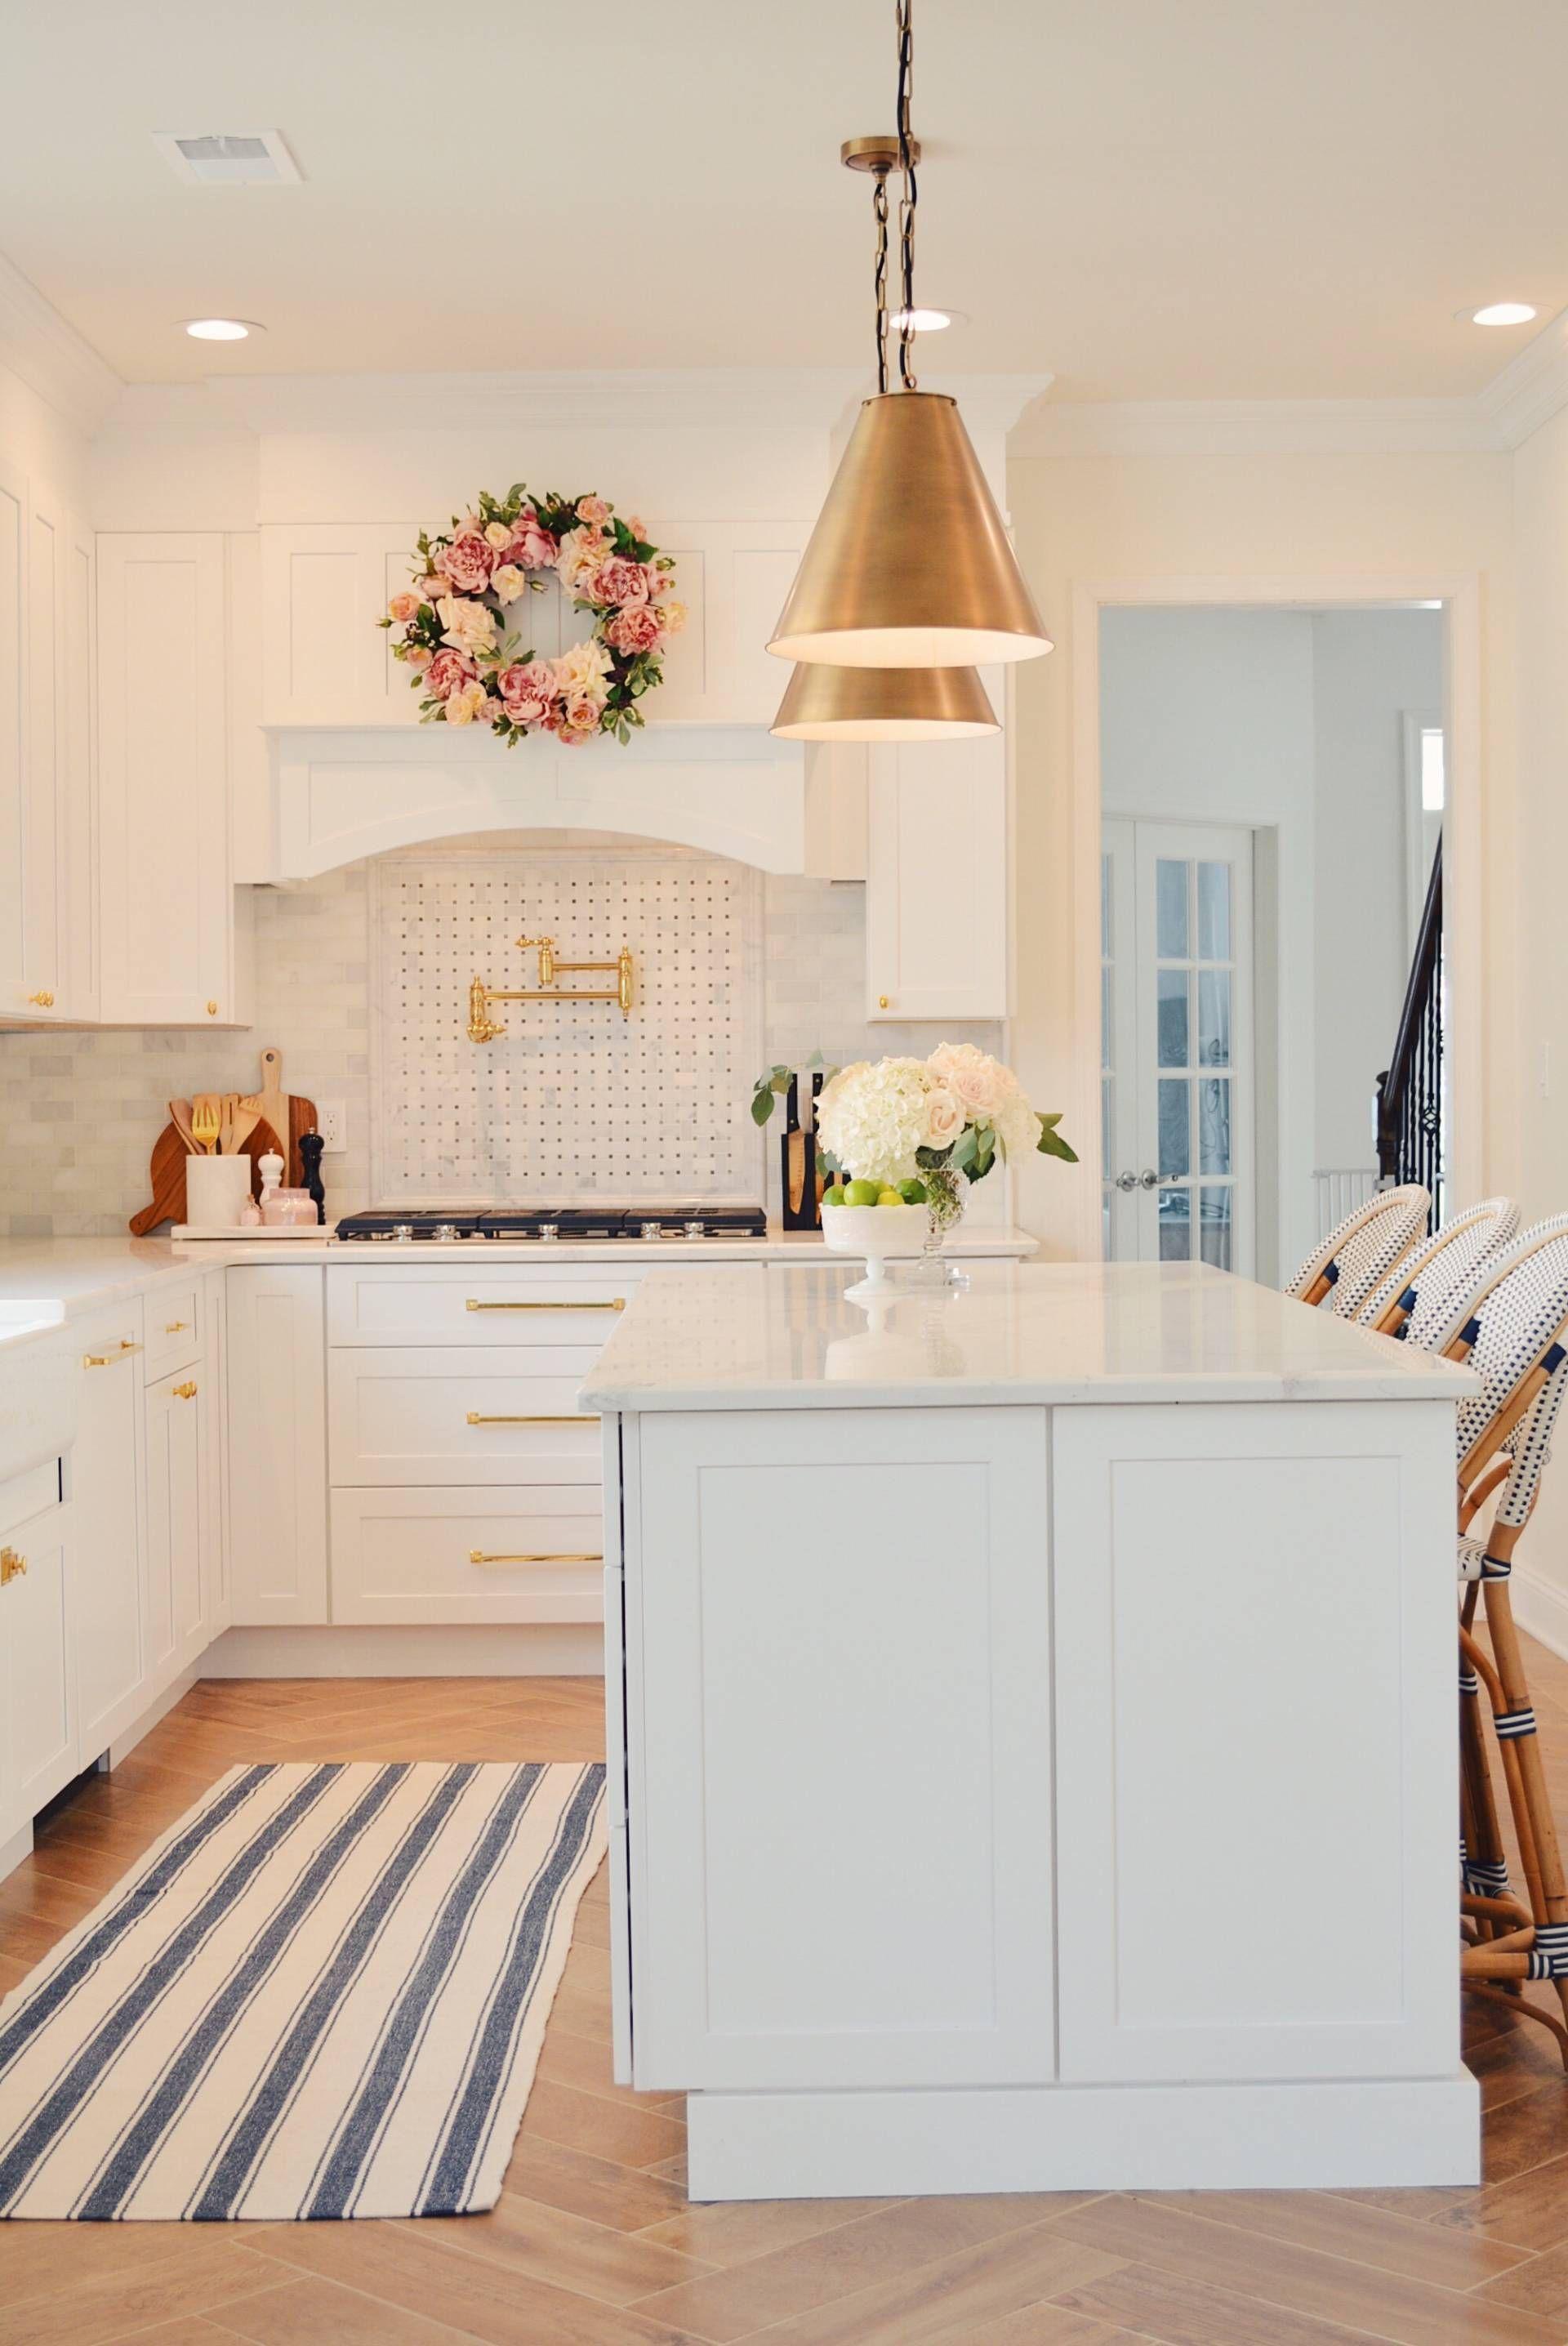 My classic white kitchen remodel in kitchen decoration diy